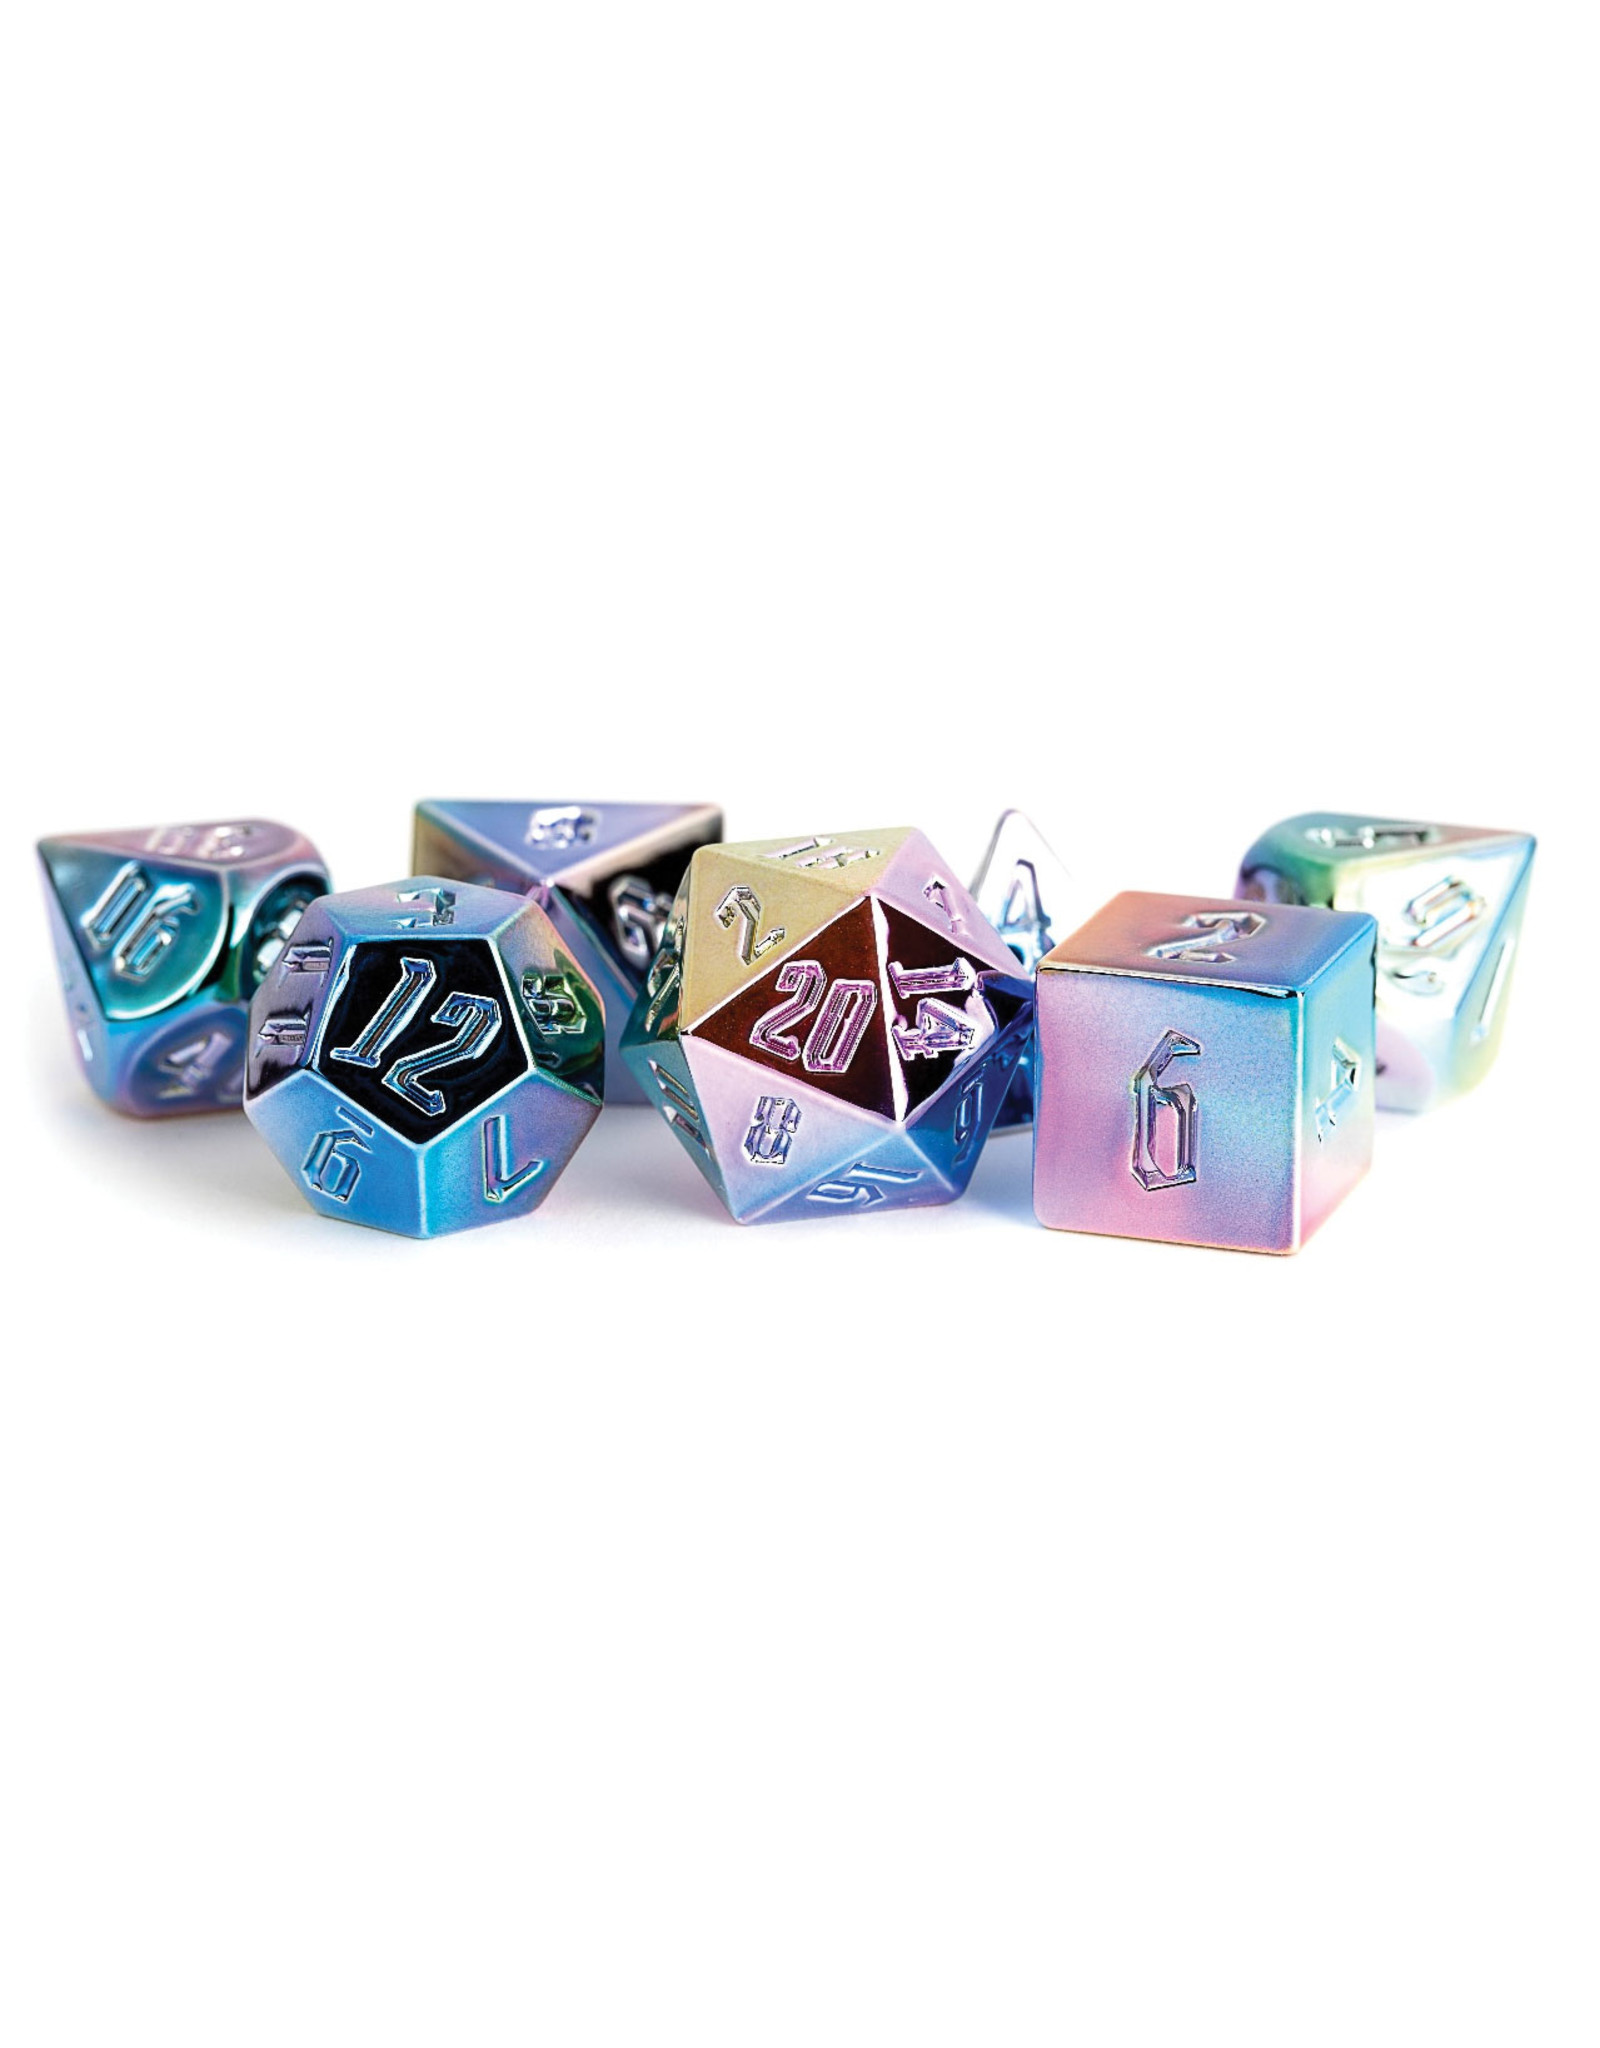 Metallic Dice Games 16mm Aluminum Plated Acrylic Poly Dice Set: Rainbow Aegis Uninked (7)